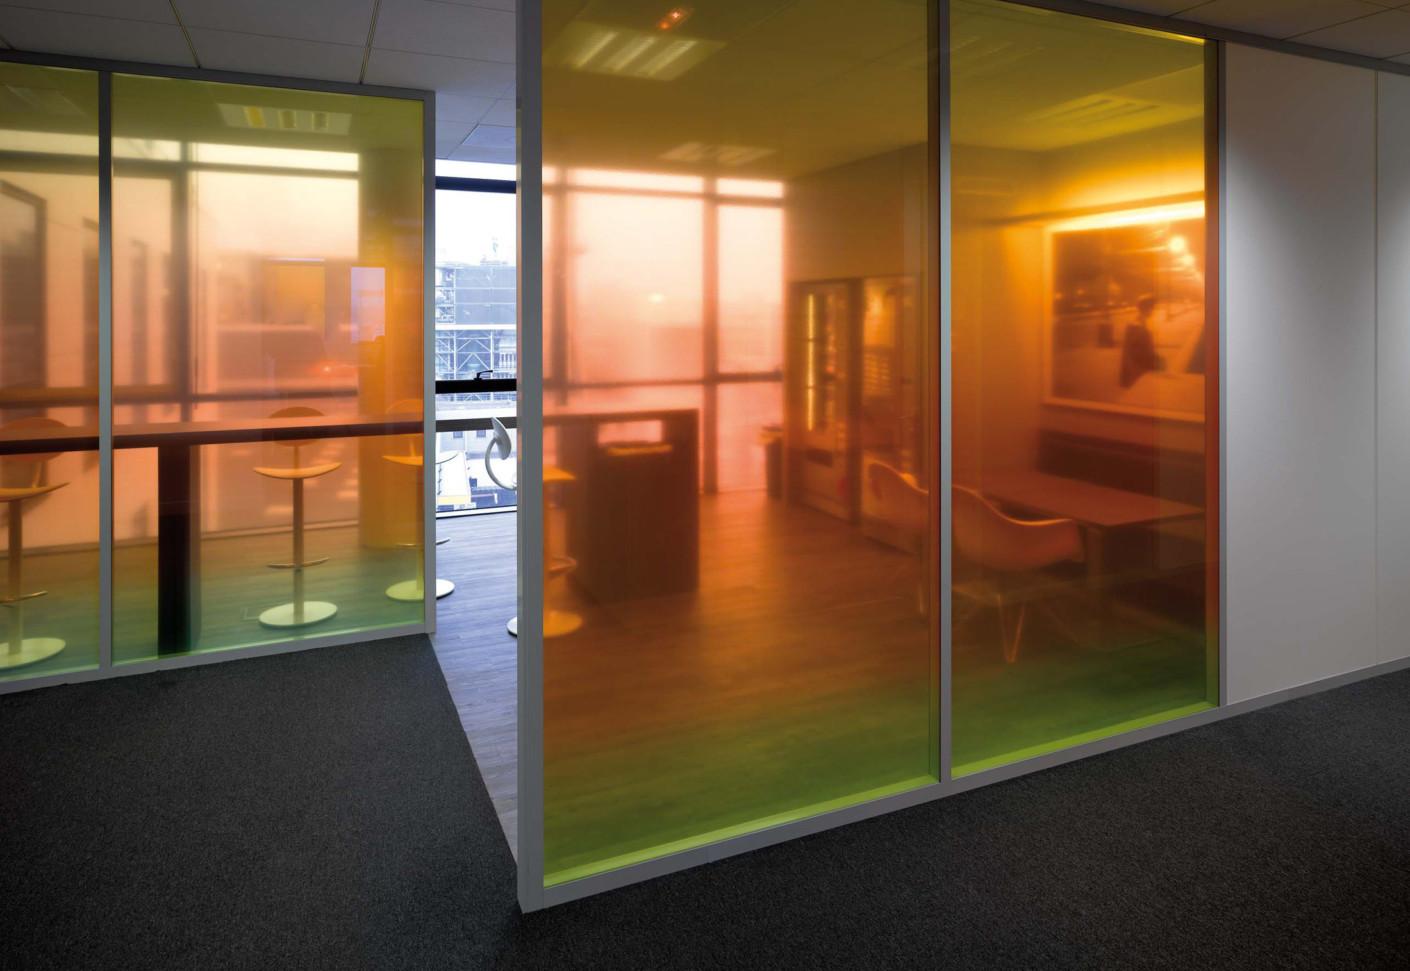 m canobloc blog von clestra hauserman stylepark. Black Bedroom Furniture Sets. Home Design Ideas